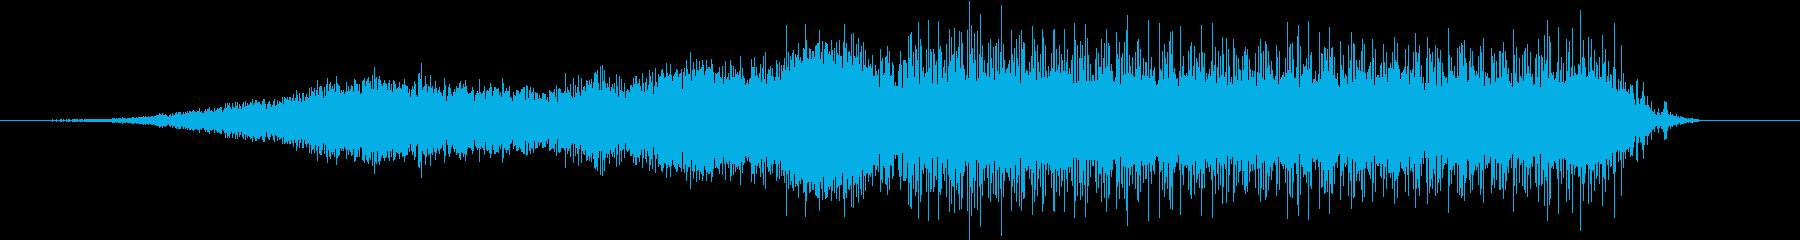 Model-t、In、Stop、O...の再生済みの波形